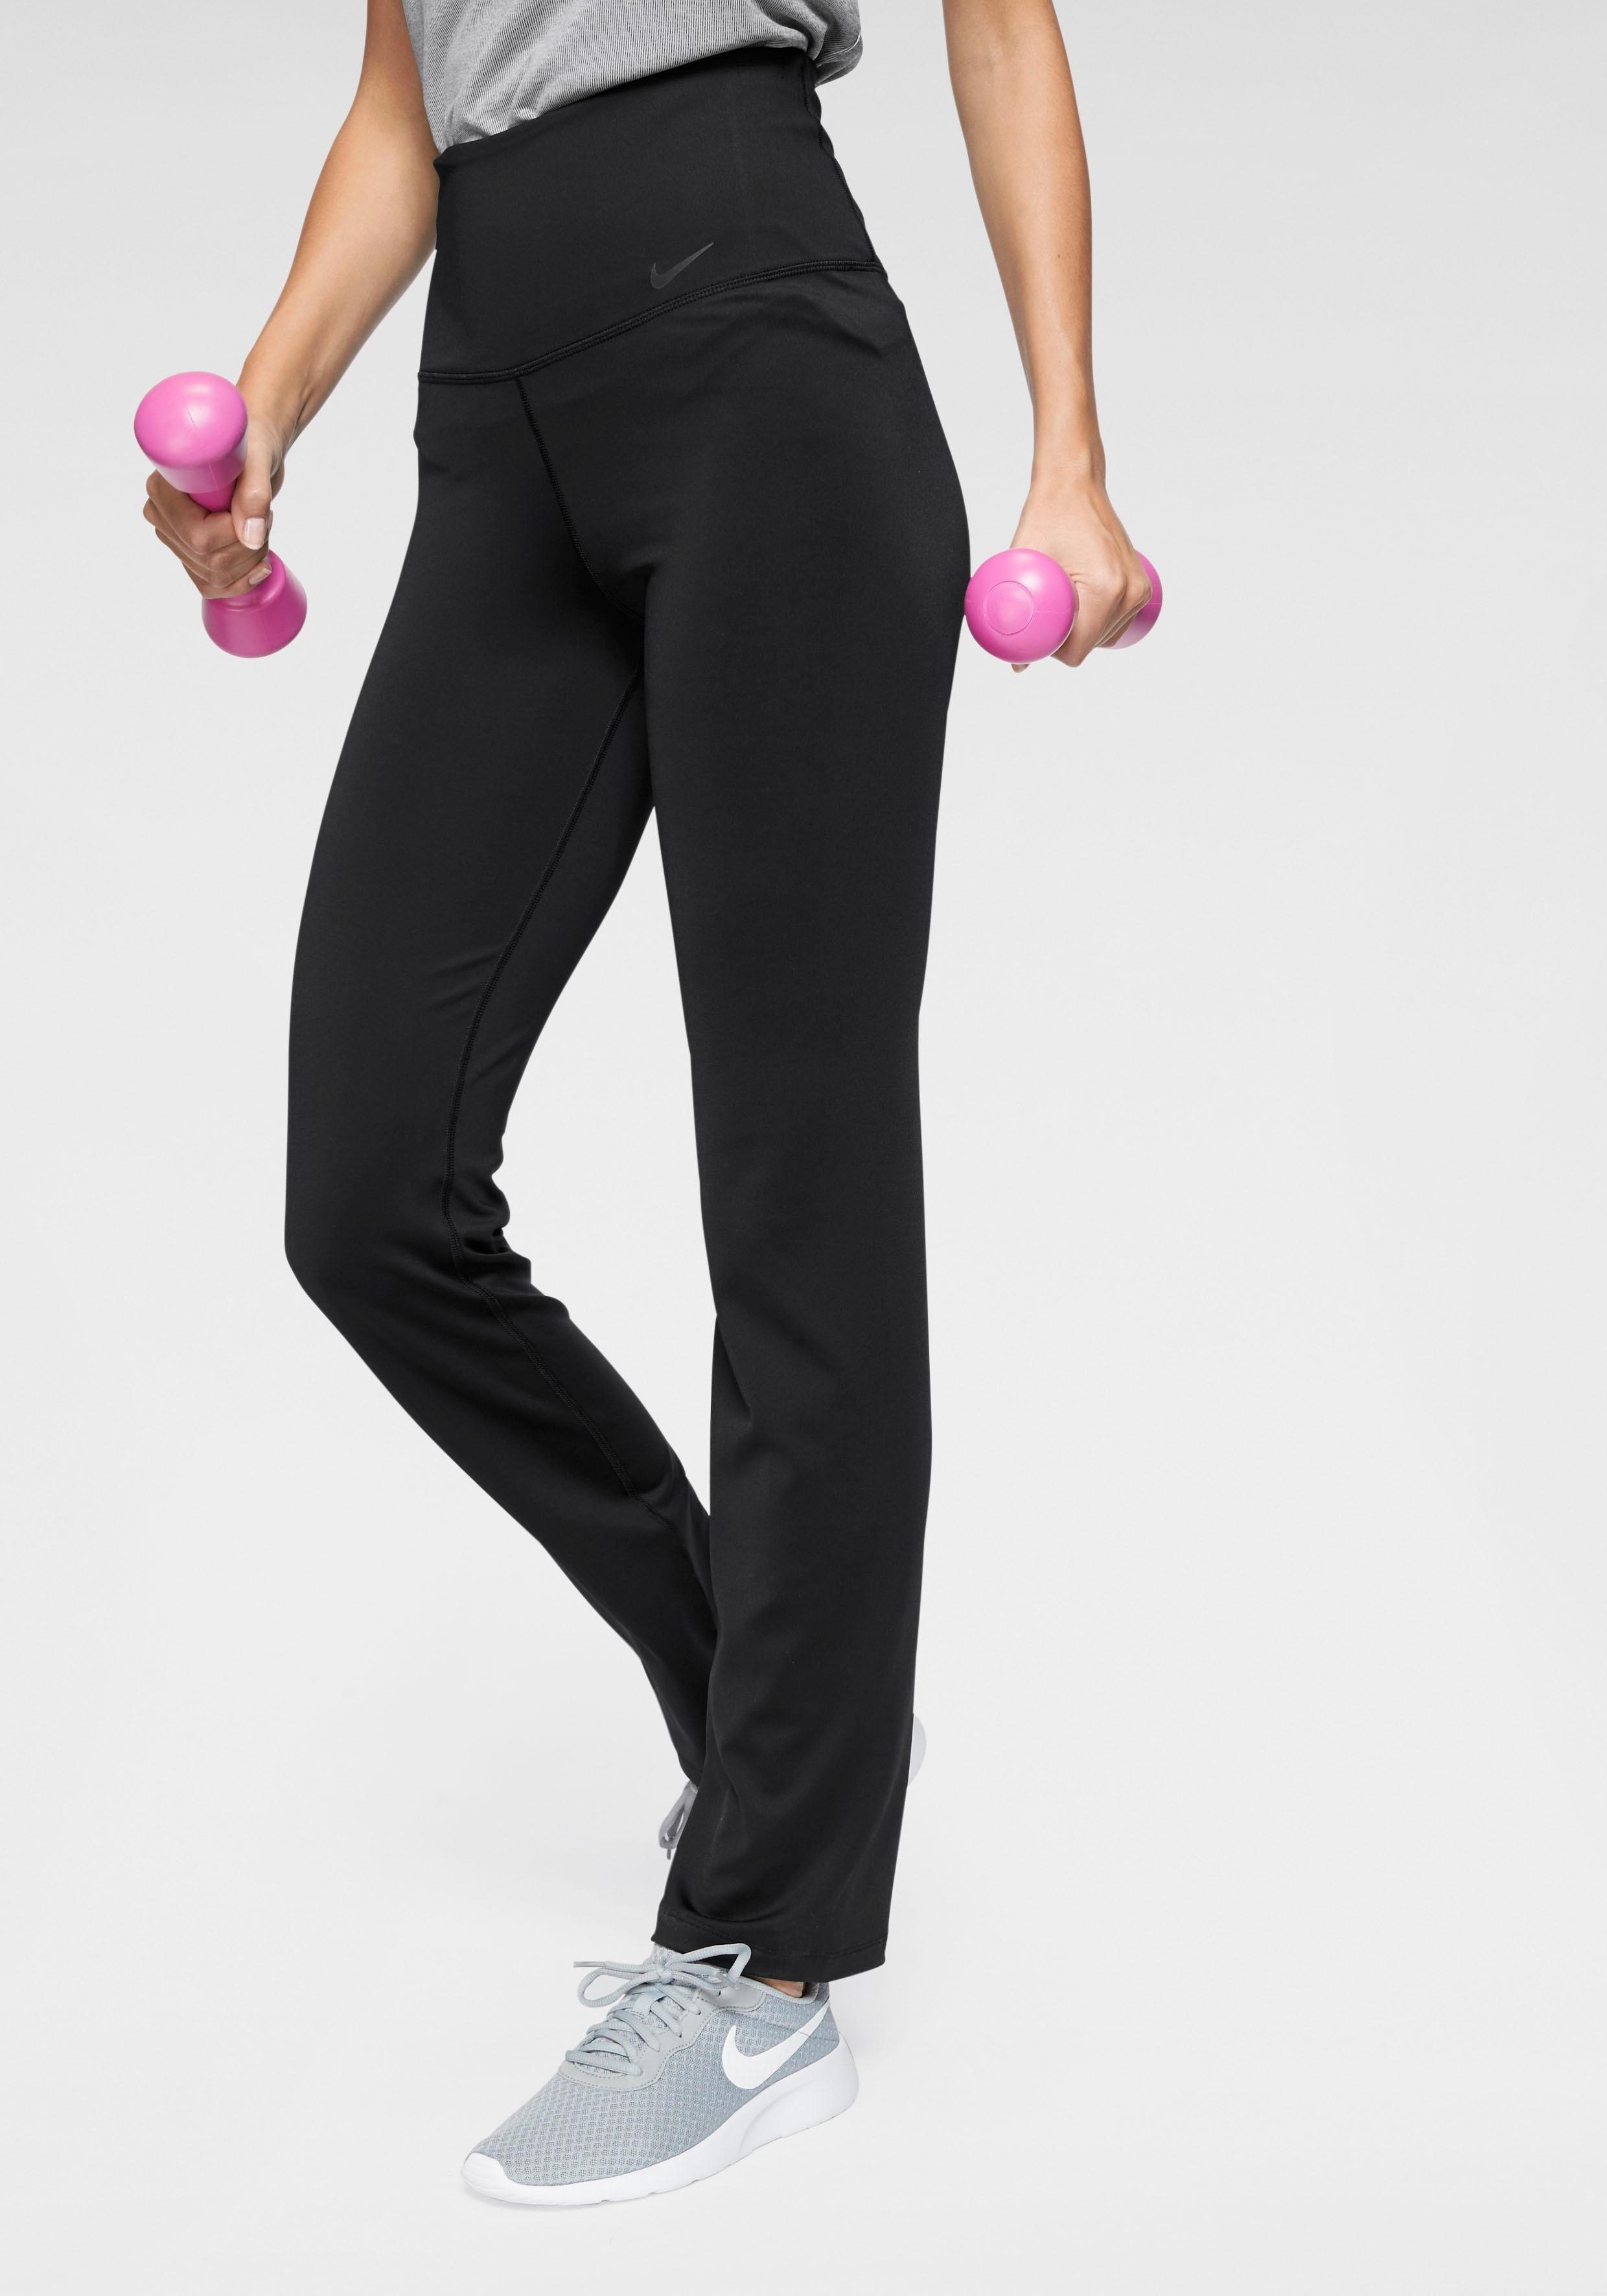 Nike Trainingsbroekw Classic Online Nk Pwr Pant Bestellen Gym rCxoeBd